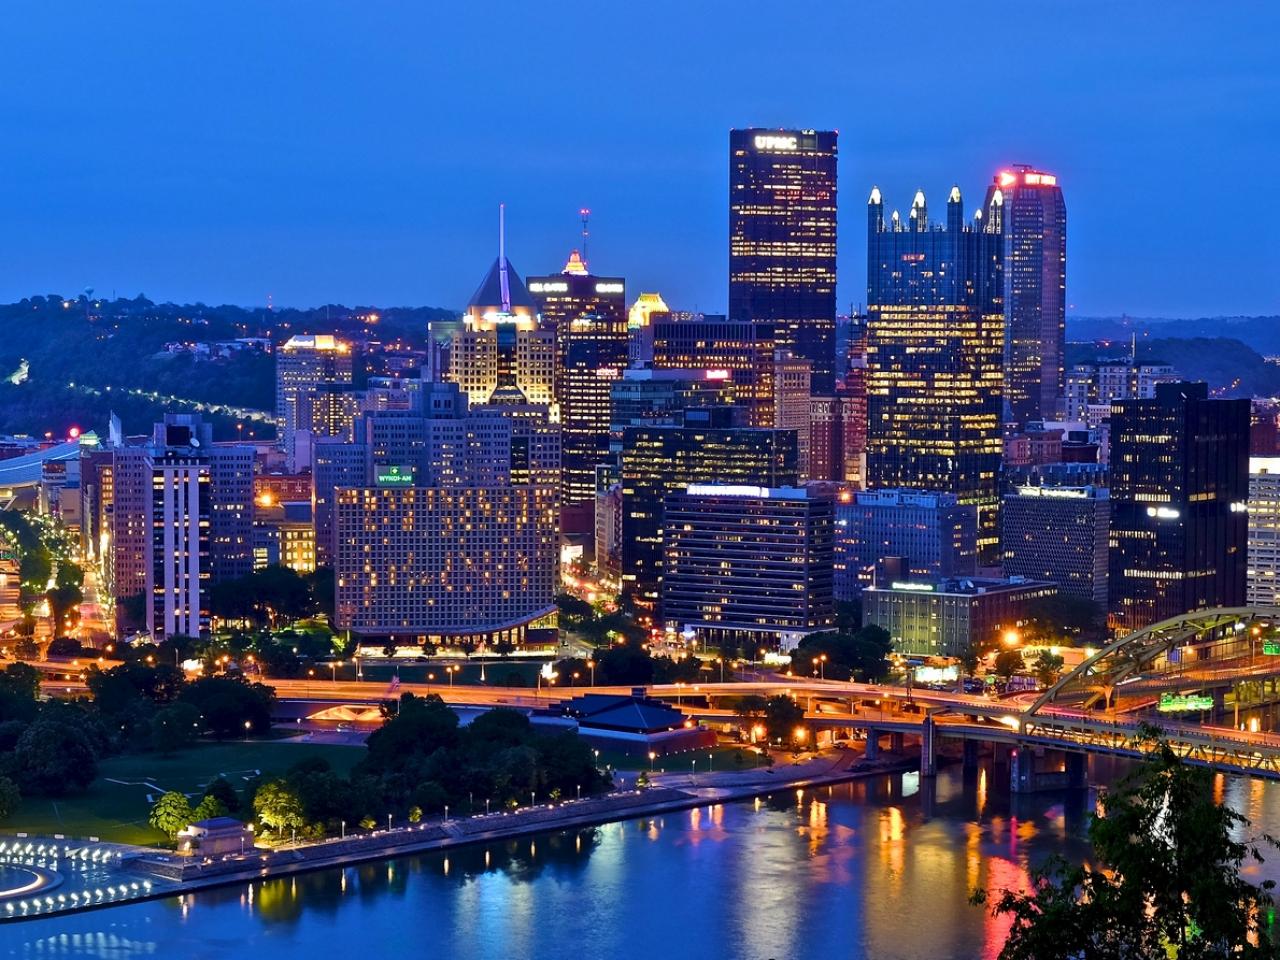 Pittsburgh - 1280x960